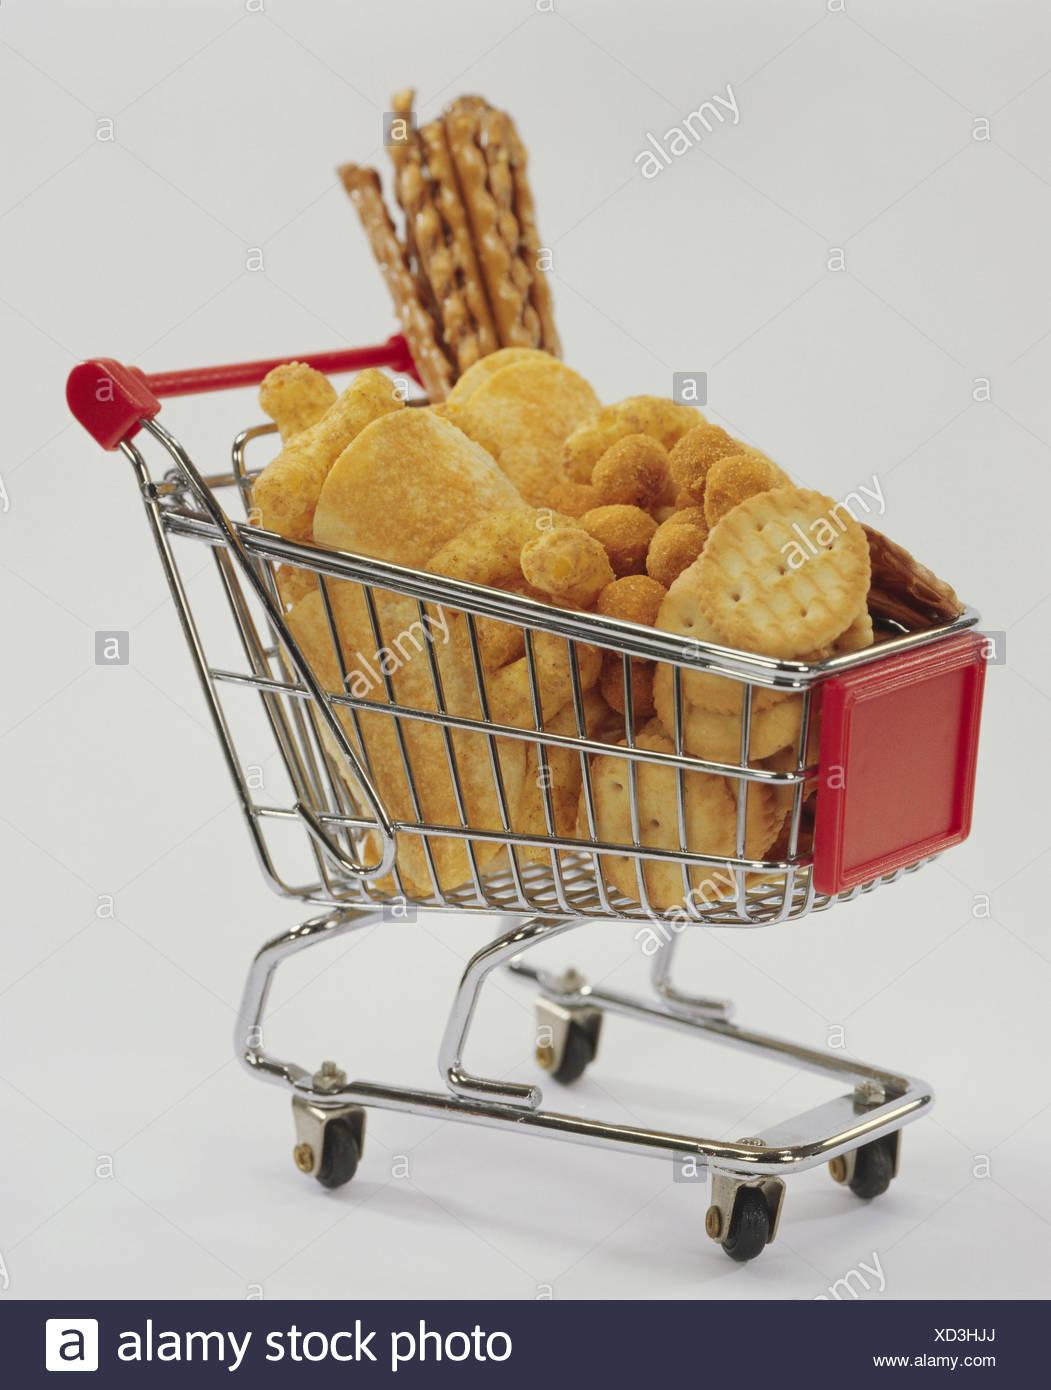 Shoppen, Karren, Miniatur, herzhafte Snacks, Kuchen, Grissini, Einkaufen, Knabbermischung, Salzstangerl, Ernährung, Einzelhandel, knabbern, Snack, Mischung, Knabberei, Partei Kuchen, salzig, Cracker, Essen, salzig, Stockbild